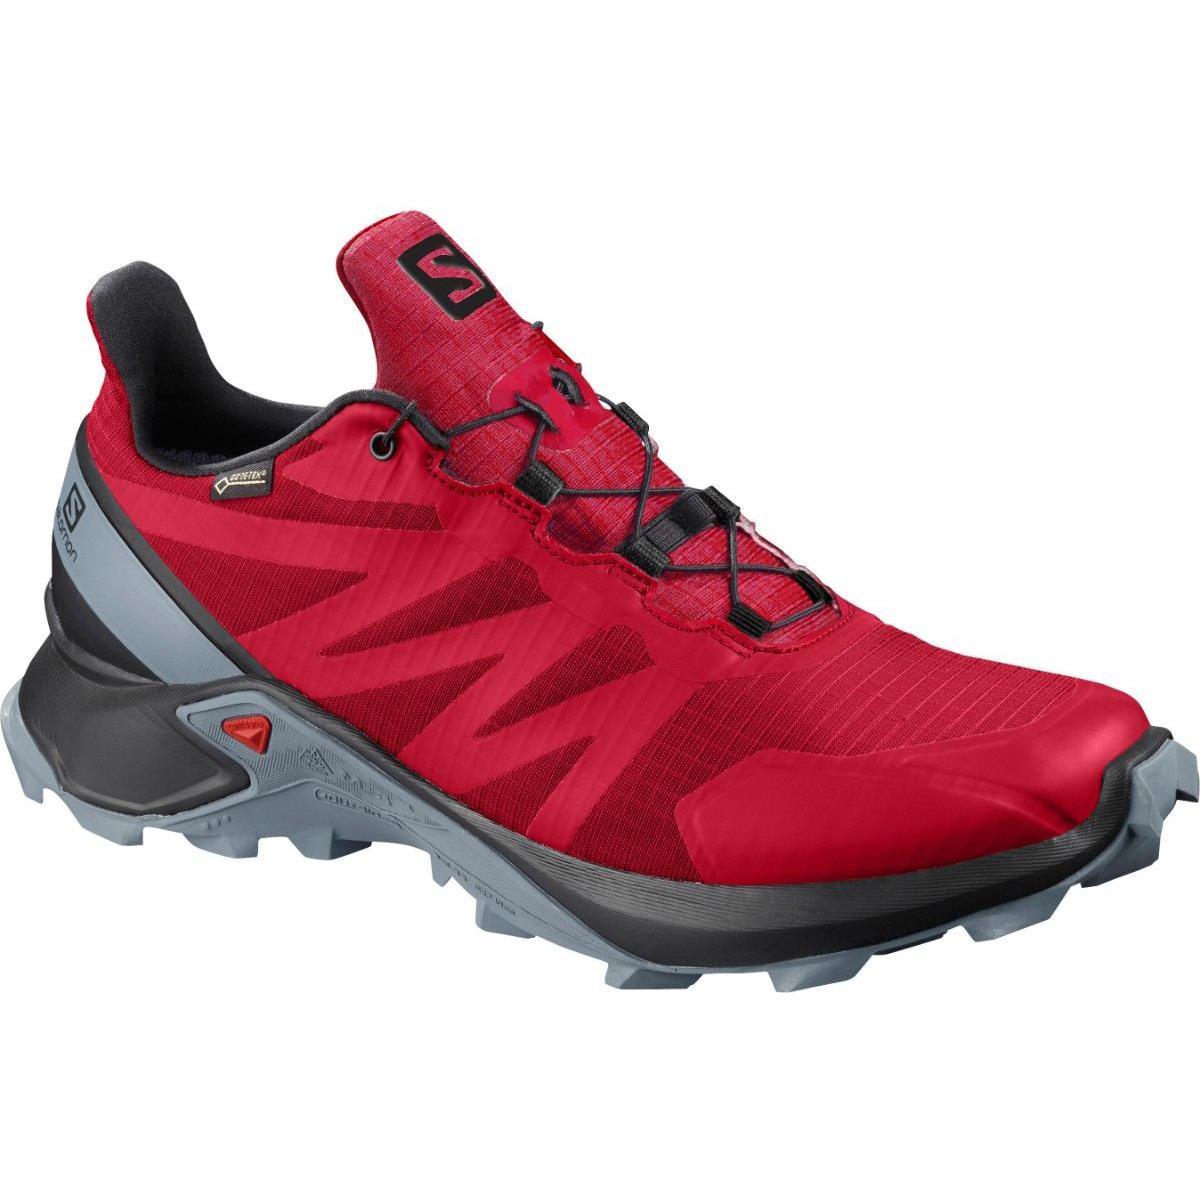 Pantofi alergare Salomon SUPERCROSS GTX – Rosu de la proalpin.ro